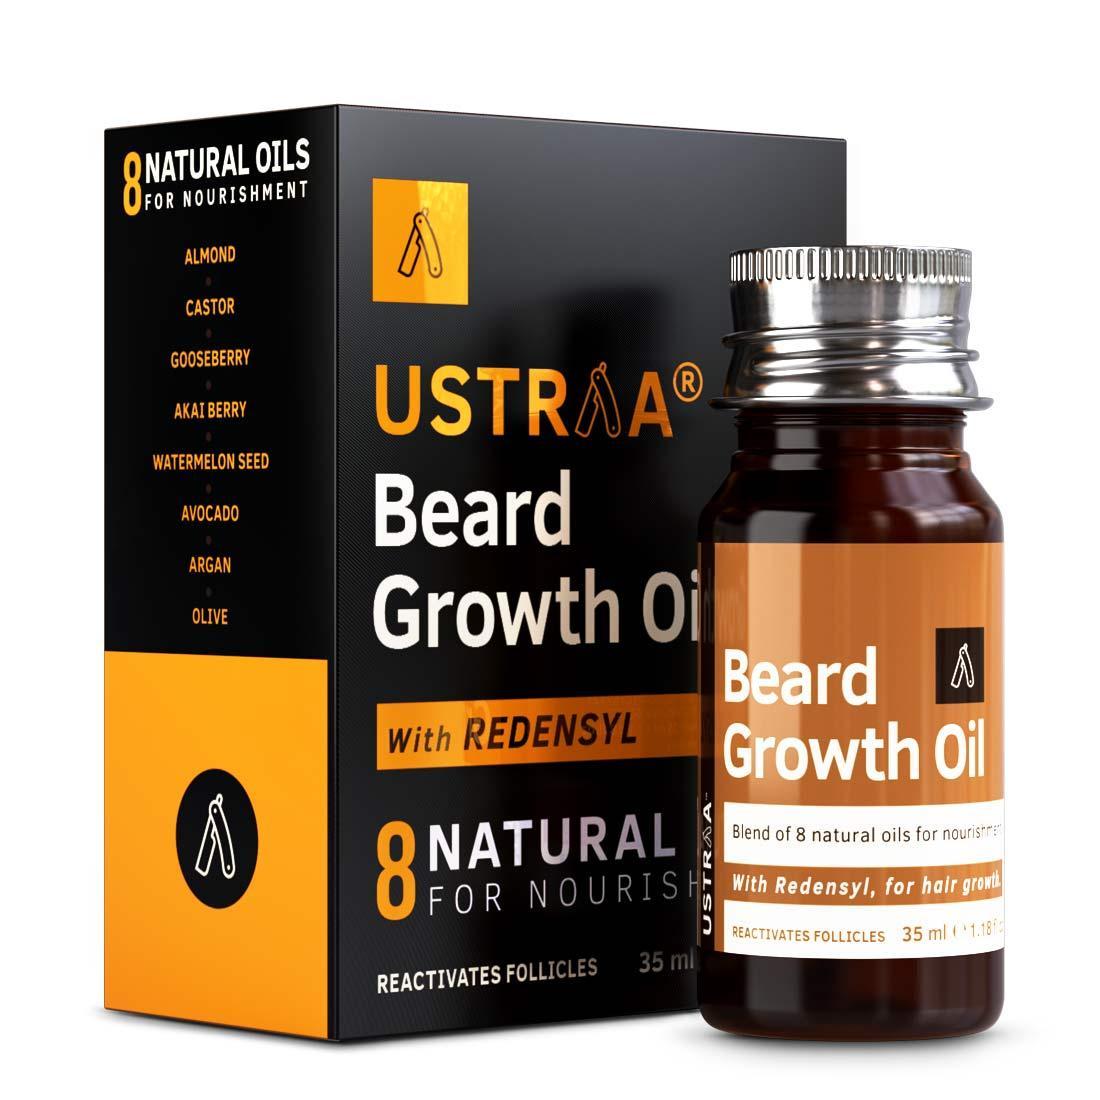 Ustraa Beard Growth Oil, Beard Oil for more Beard Growth with Redensyl, 8 Natural Oils including Jojoba Oil & Vitamin E, 35ml